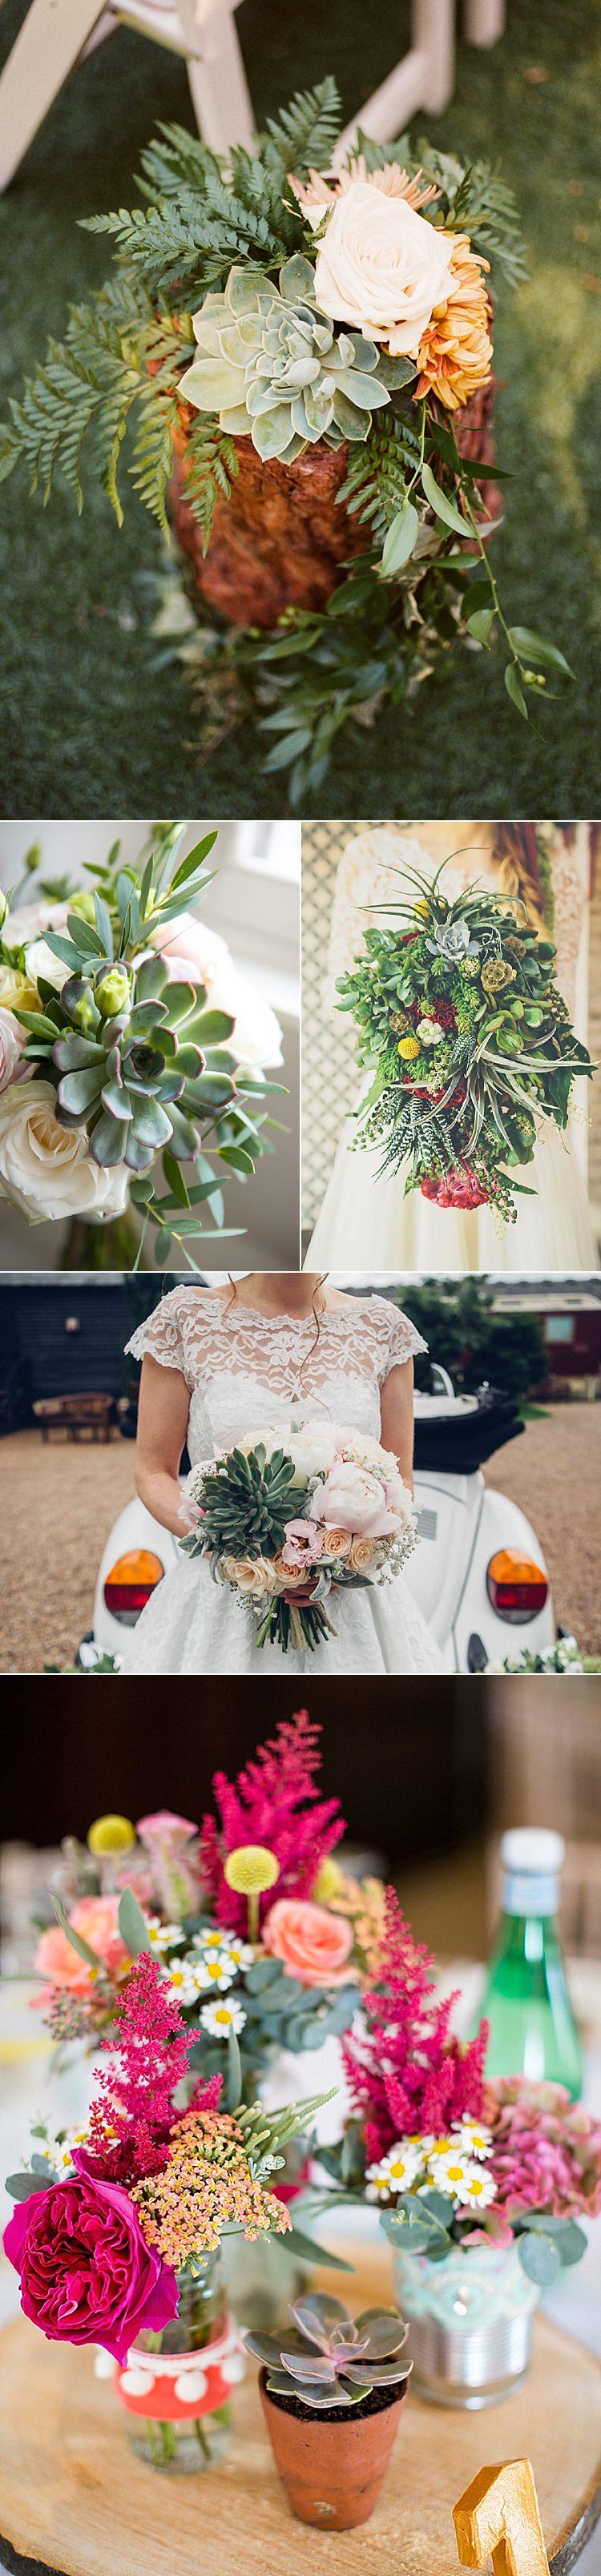 Alternative Wedding Flower Ideas Bouquet Succulents